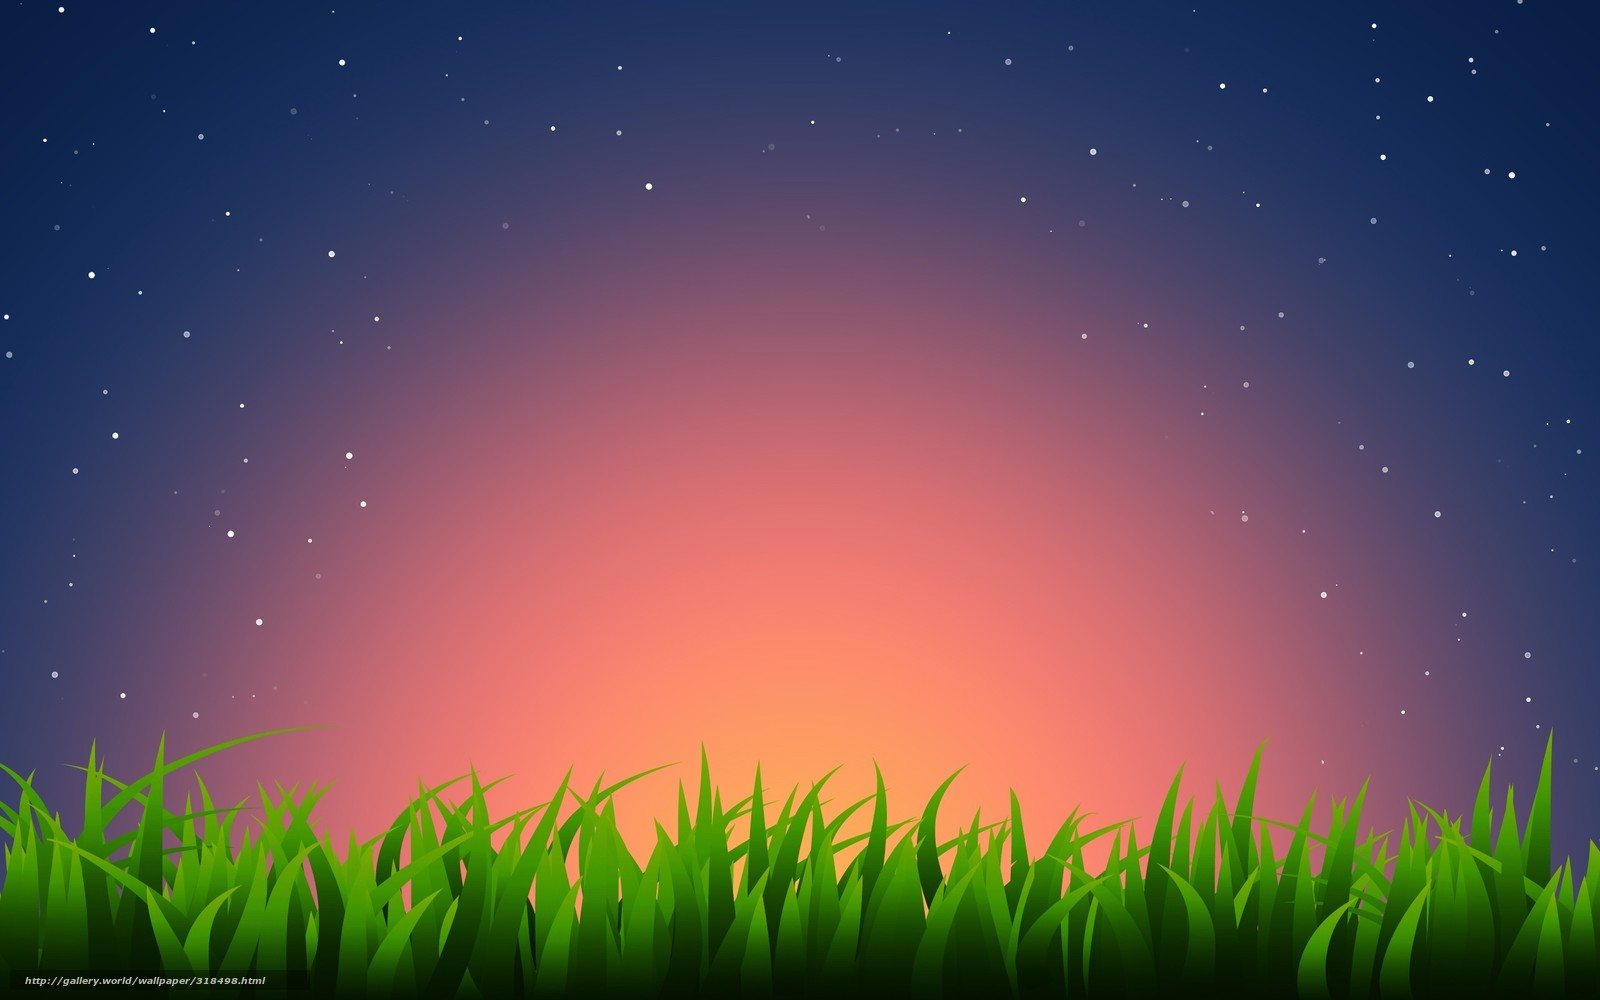 download wallpaper grass star sunset free desktop wallpaper in the resolution 2560x1600 picture 318498 gde fon com